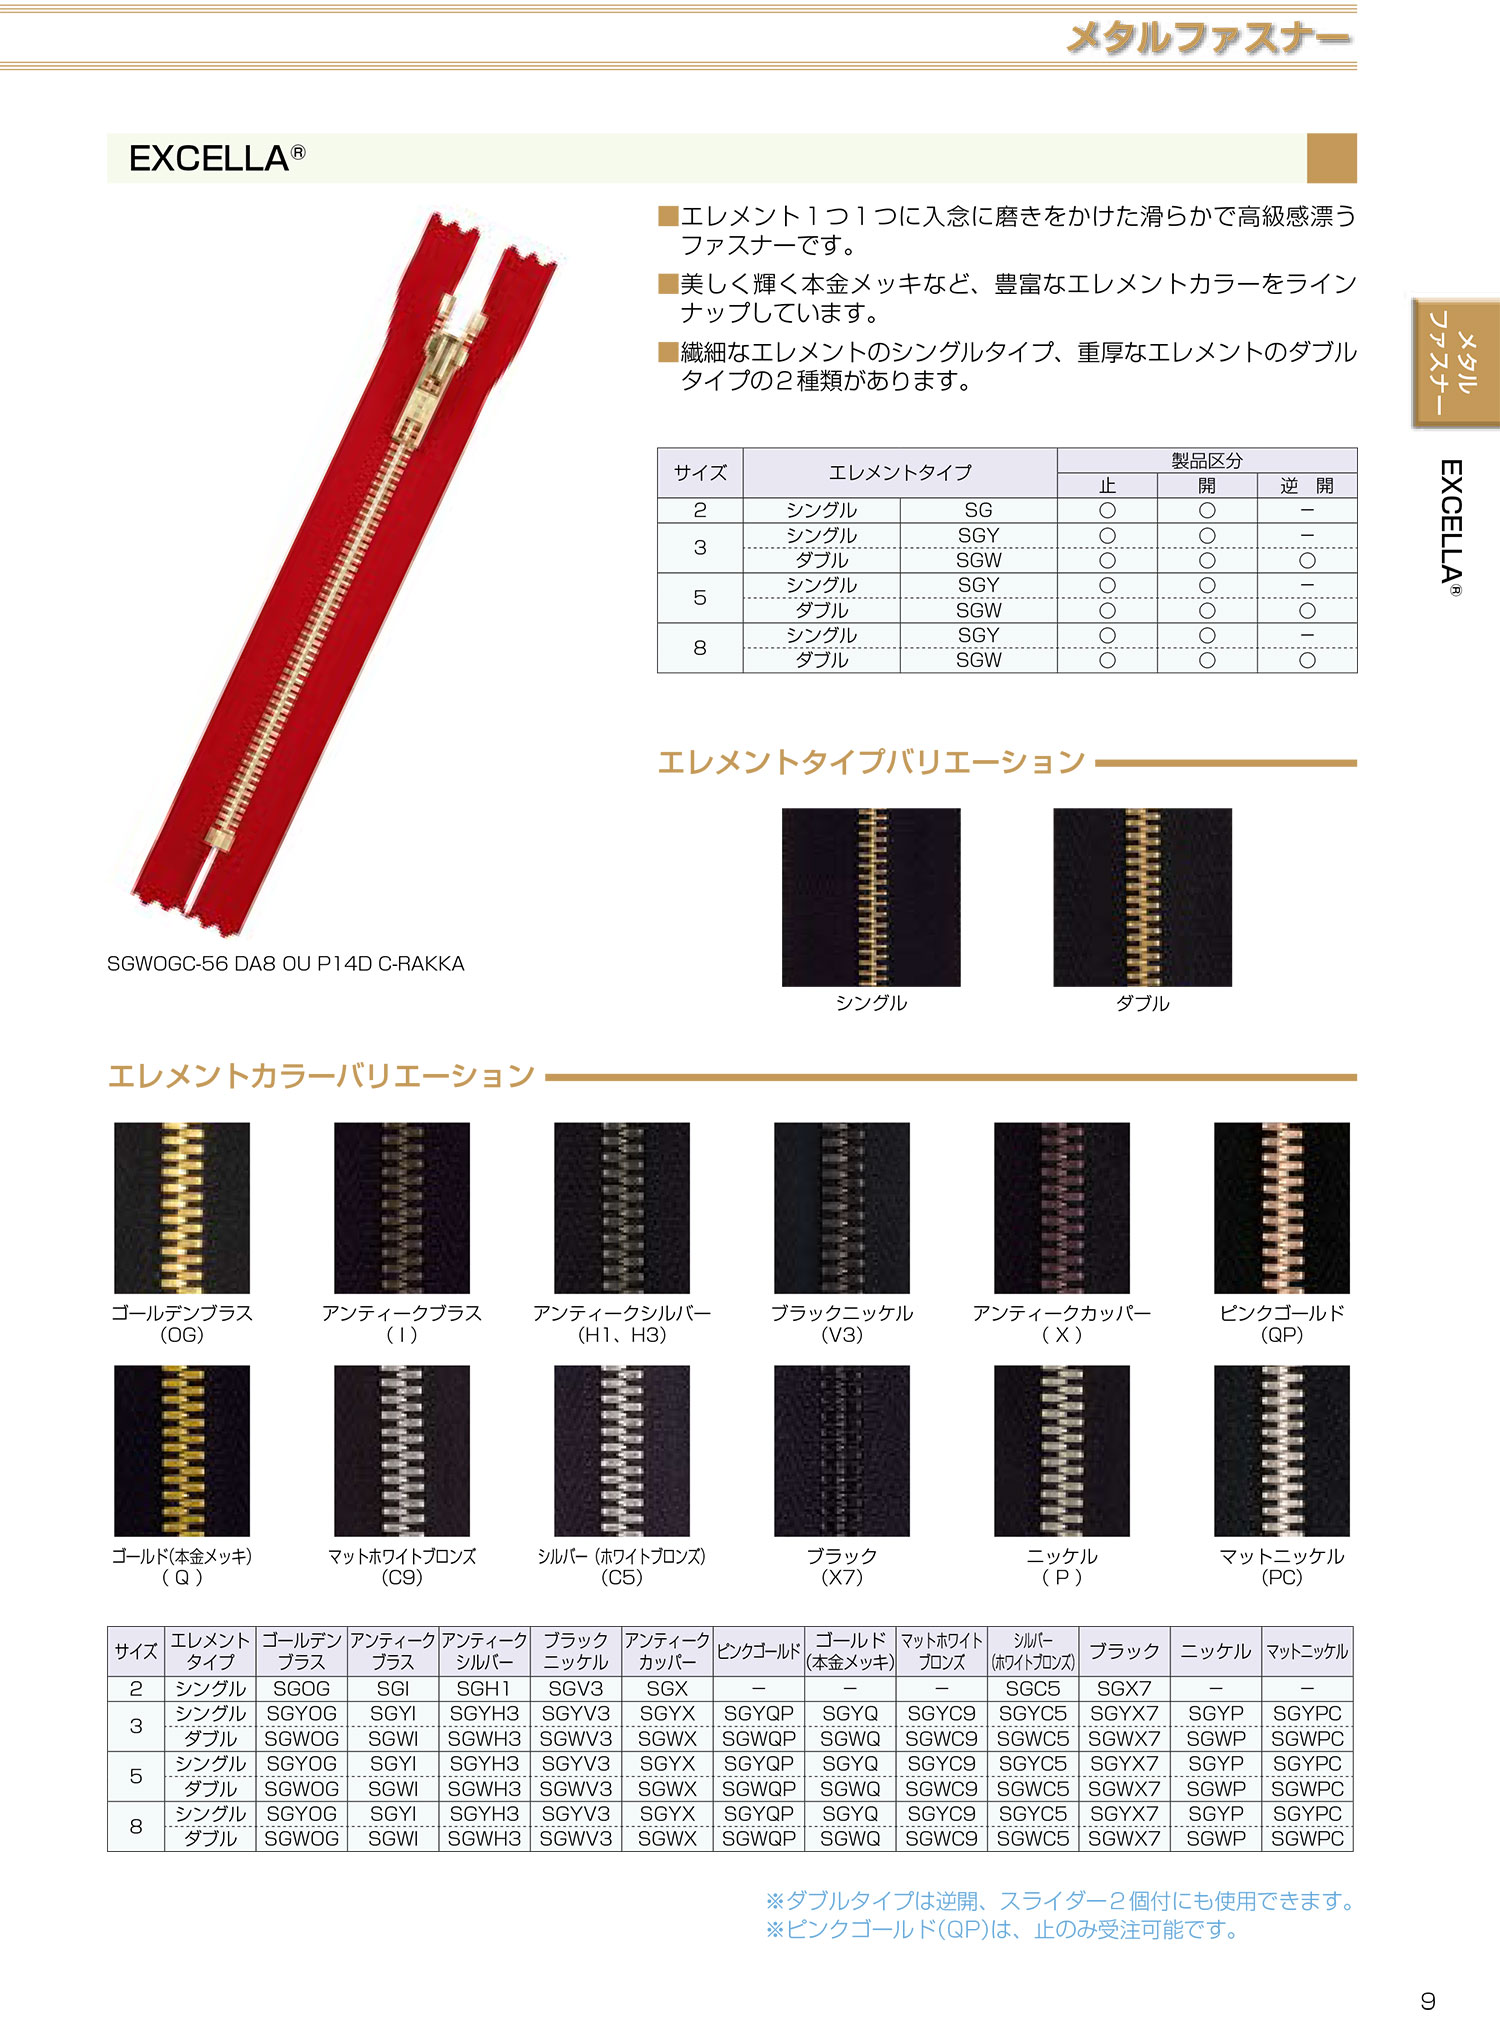 8SGYV3OR エクセラ 8サイズ ブラックニッケル オープン シングル[ファスナー] YKK/オークラ商事 - ApparelX アパレル資材卸通販